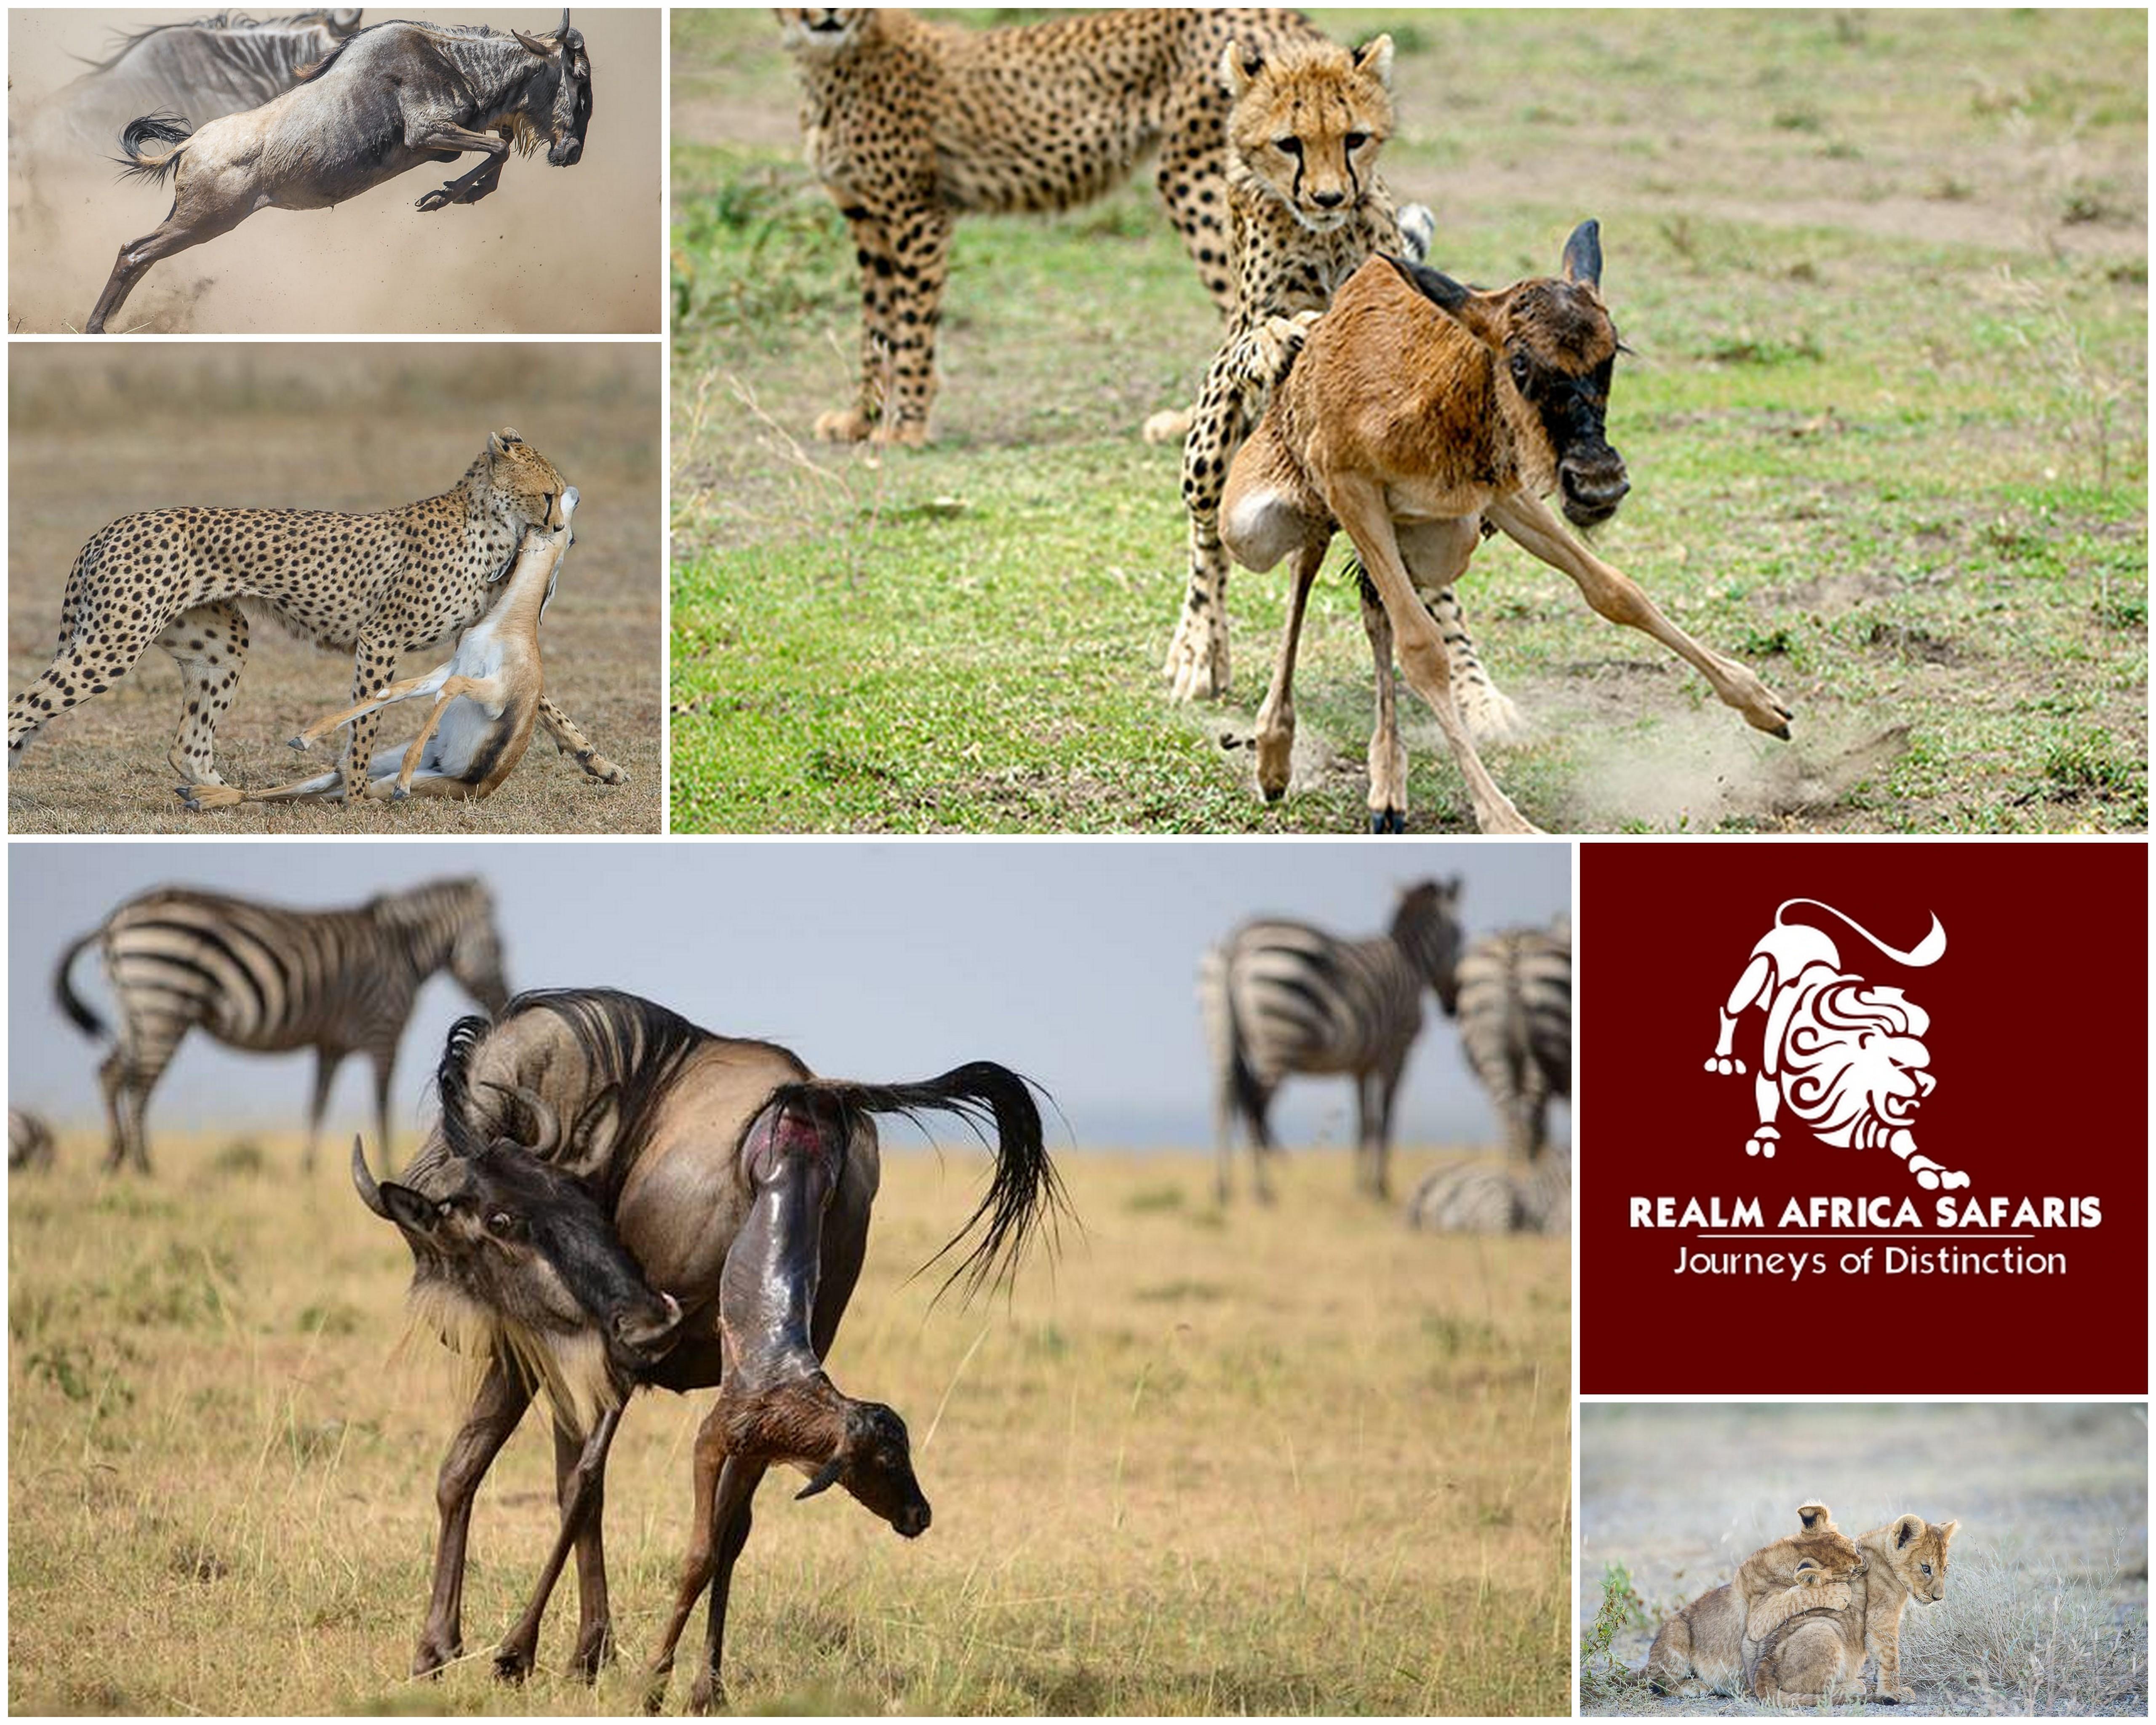 Wildebeest calving season in serengeti | Tanmzania Safari | Realm Africa Safaris